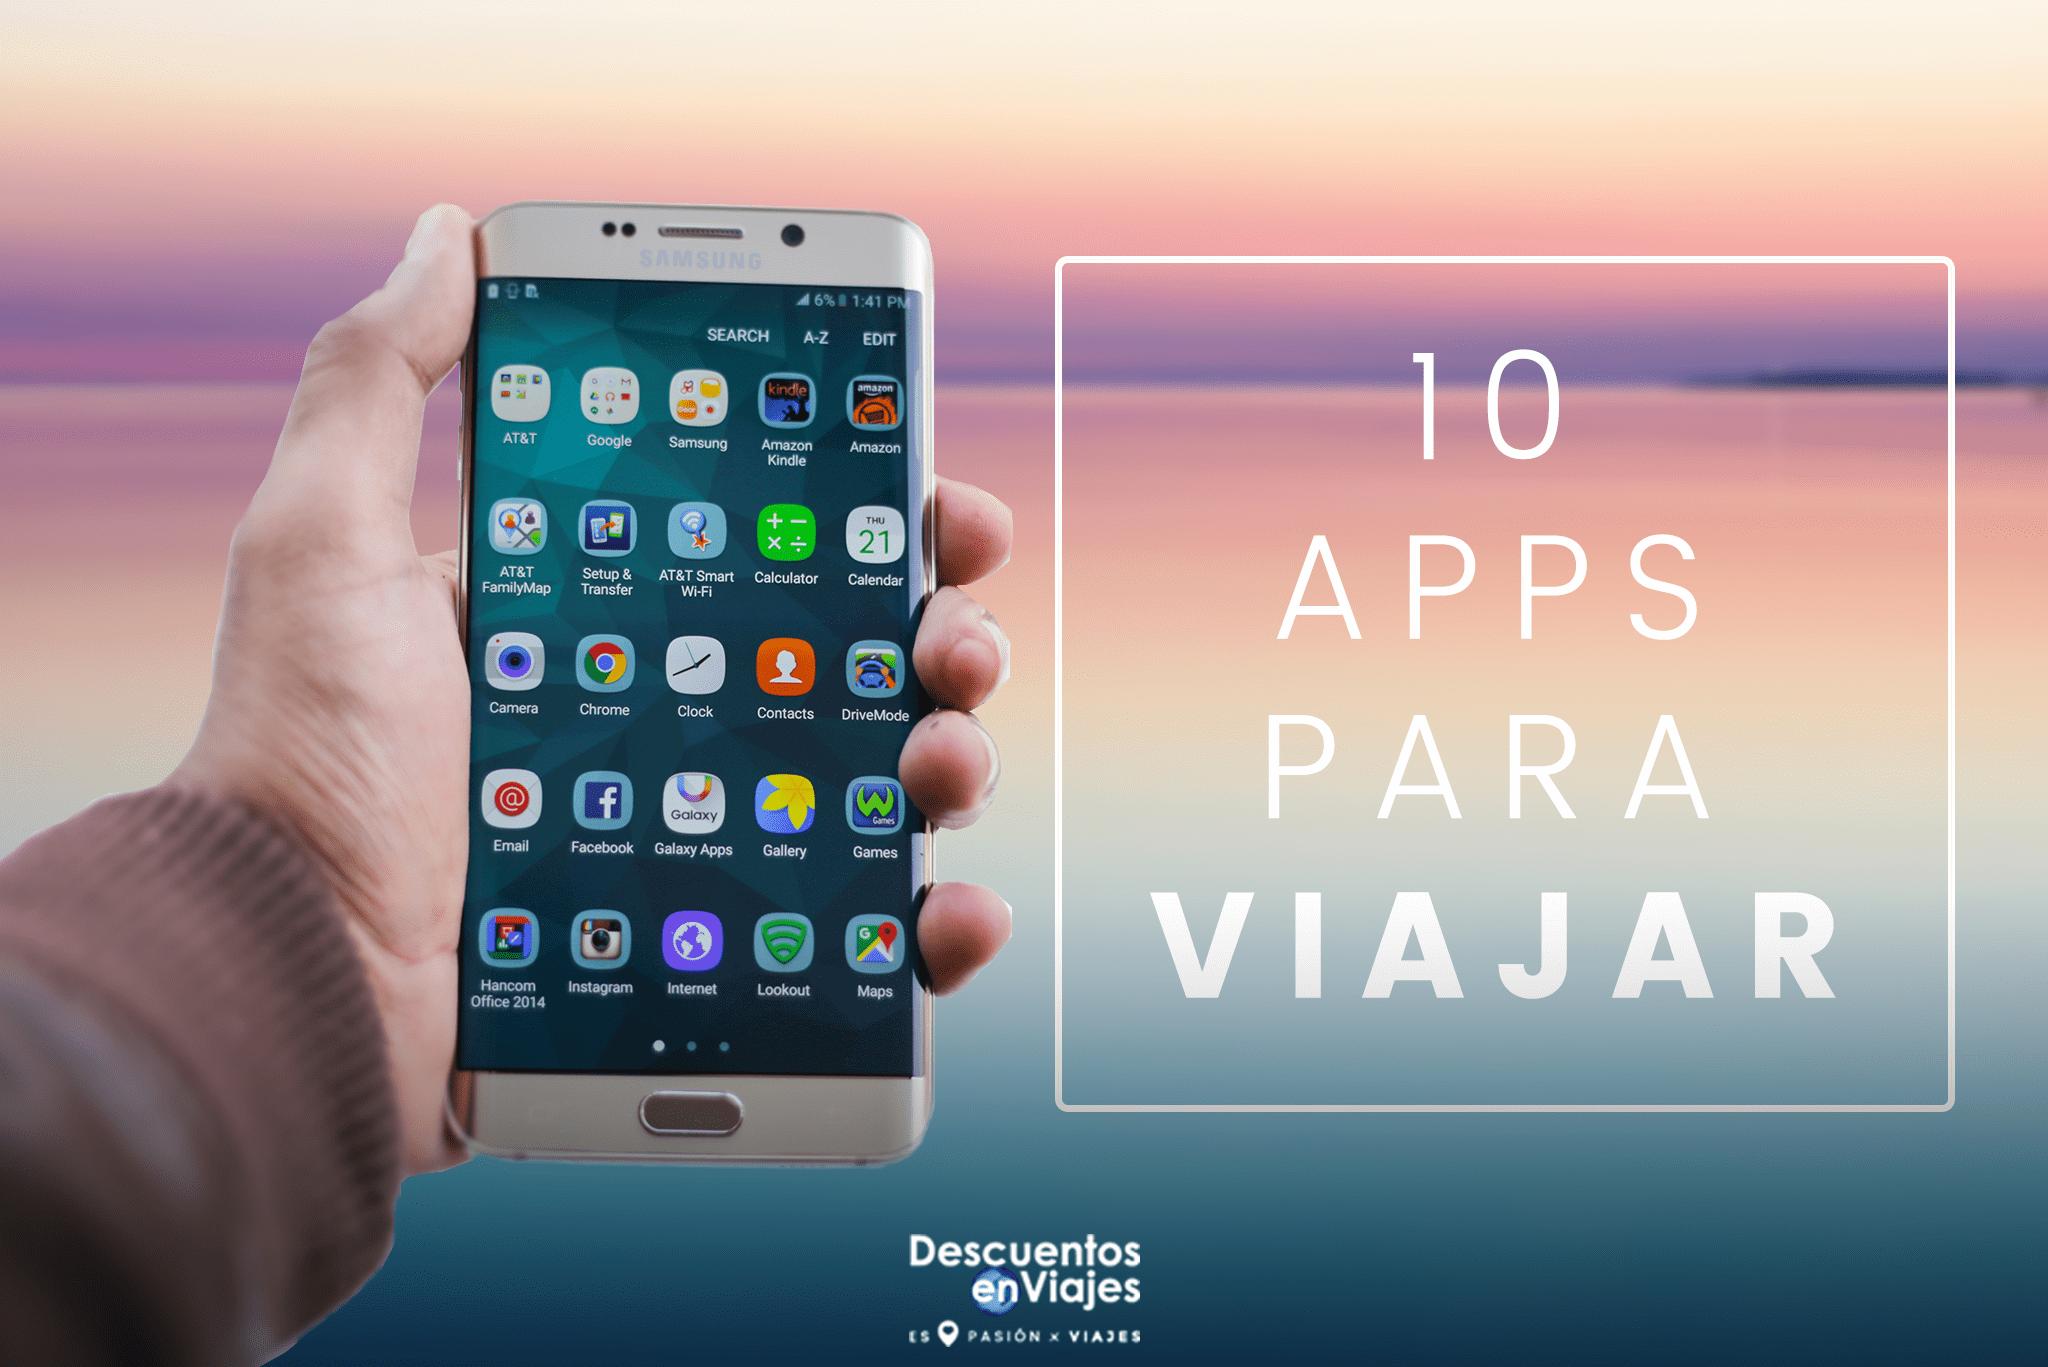 10 apps para viajar